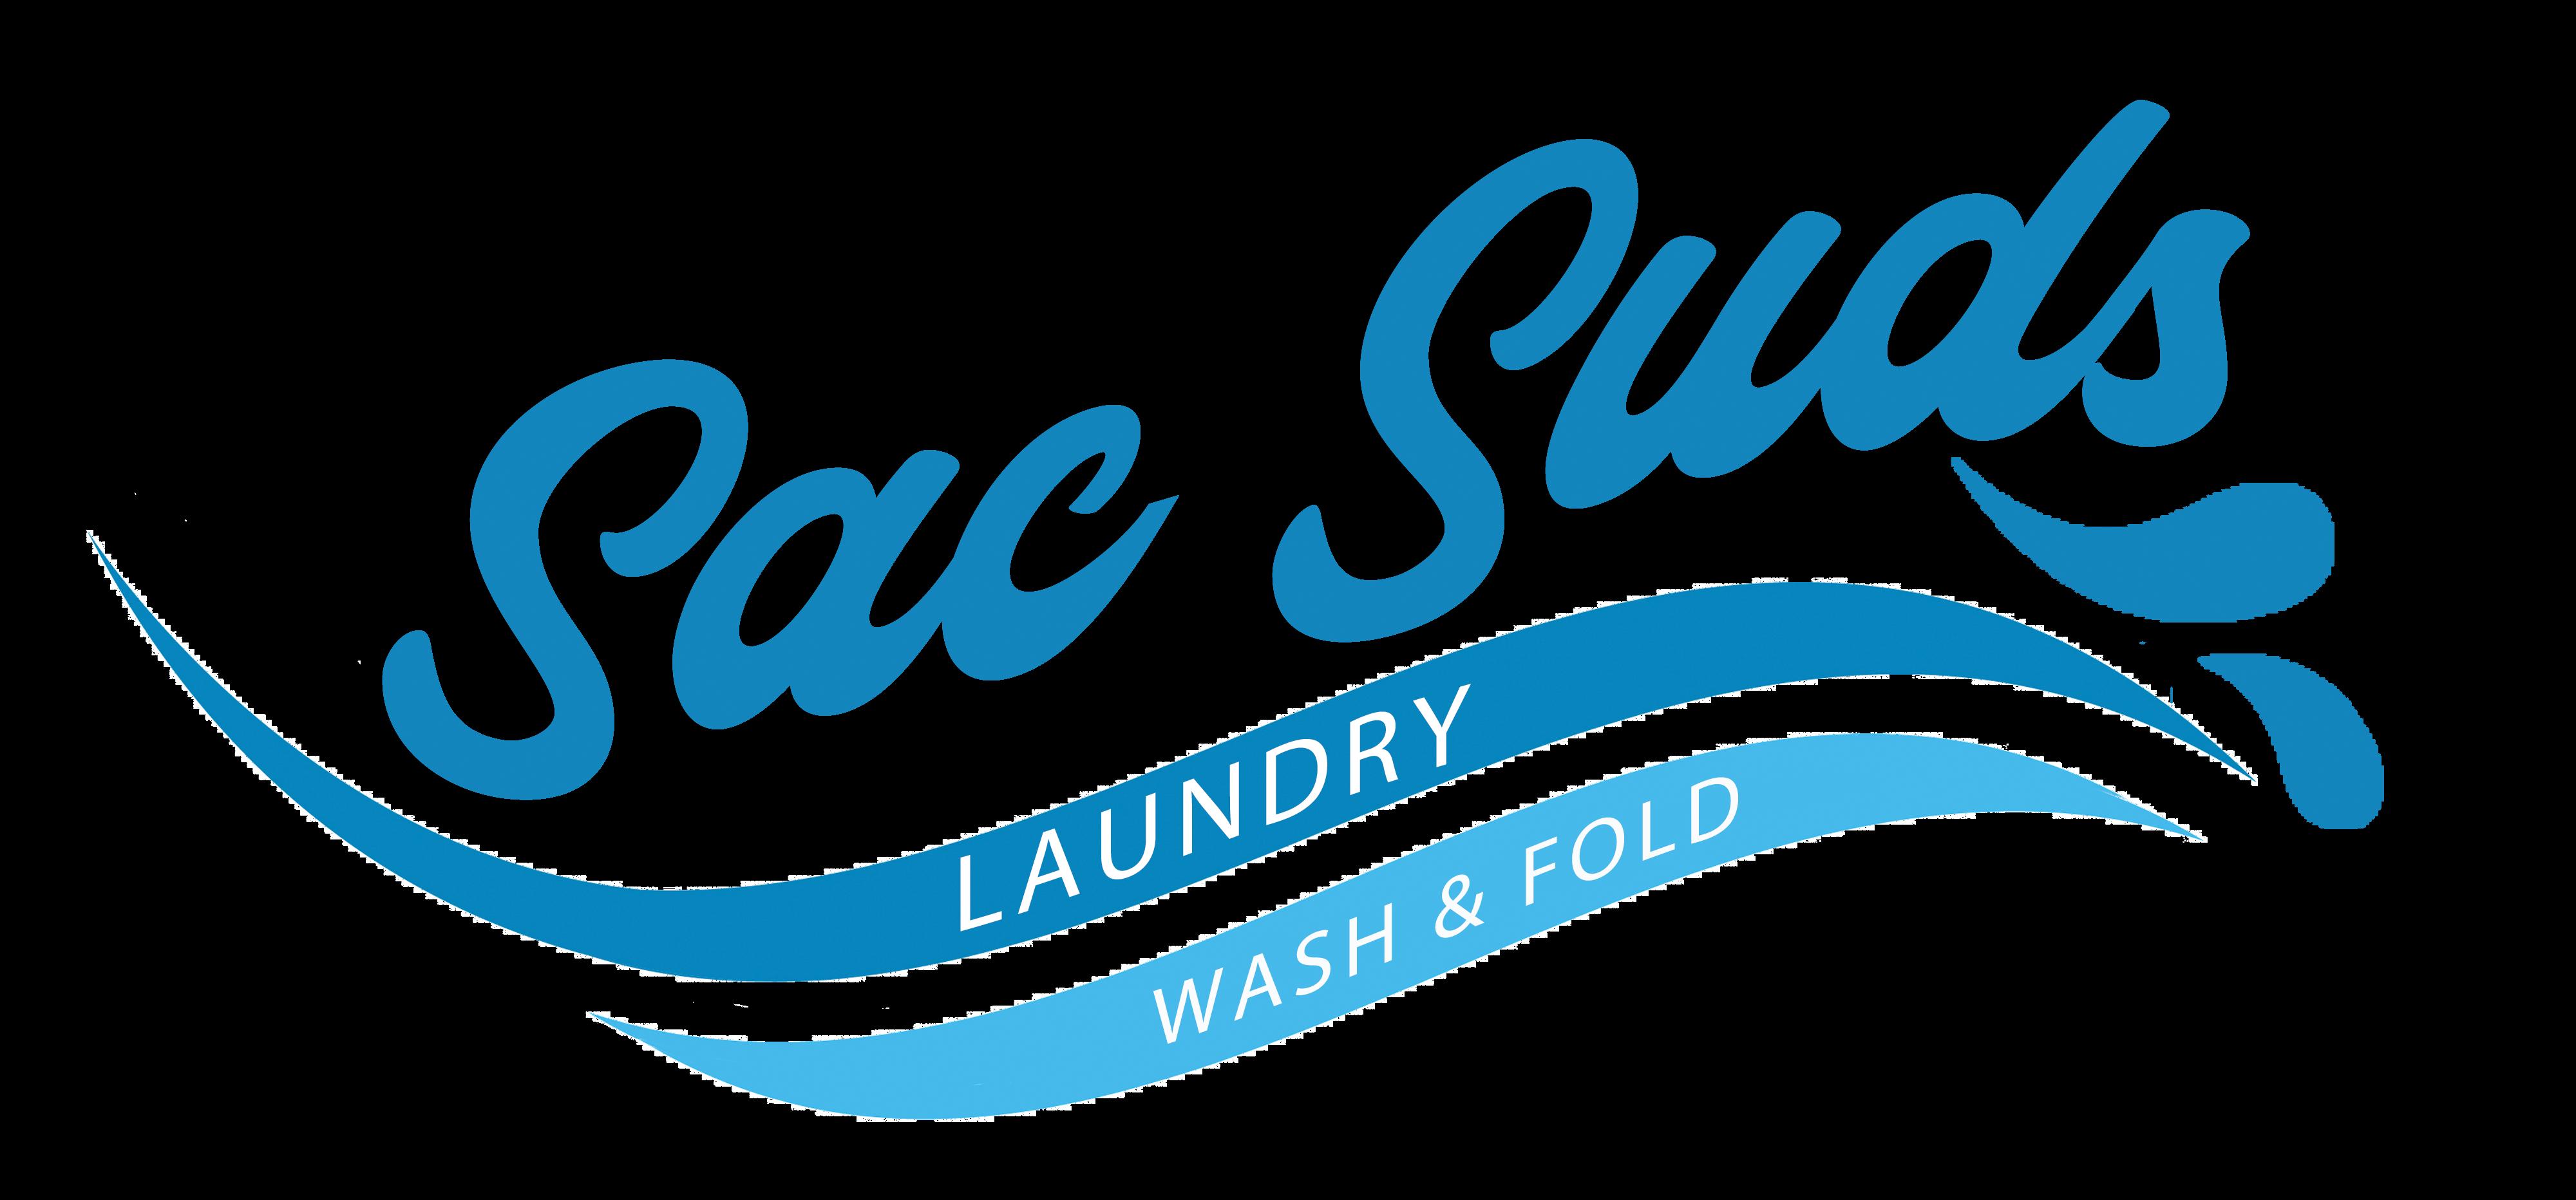 Sac Suds Laundry